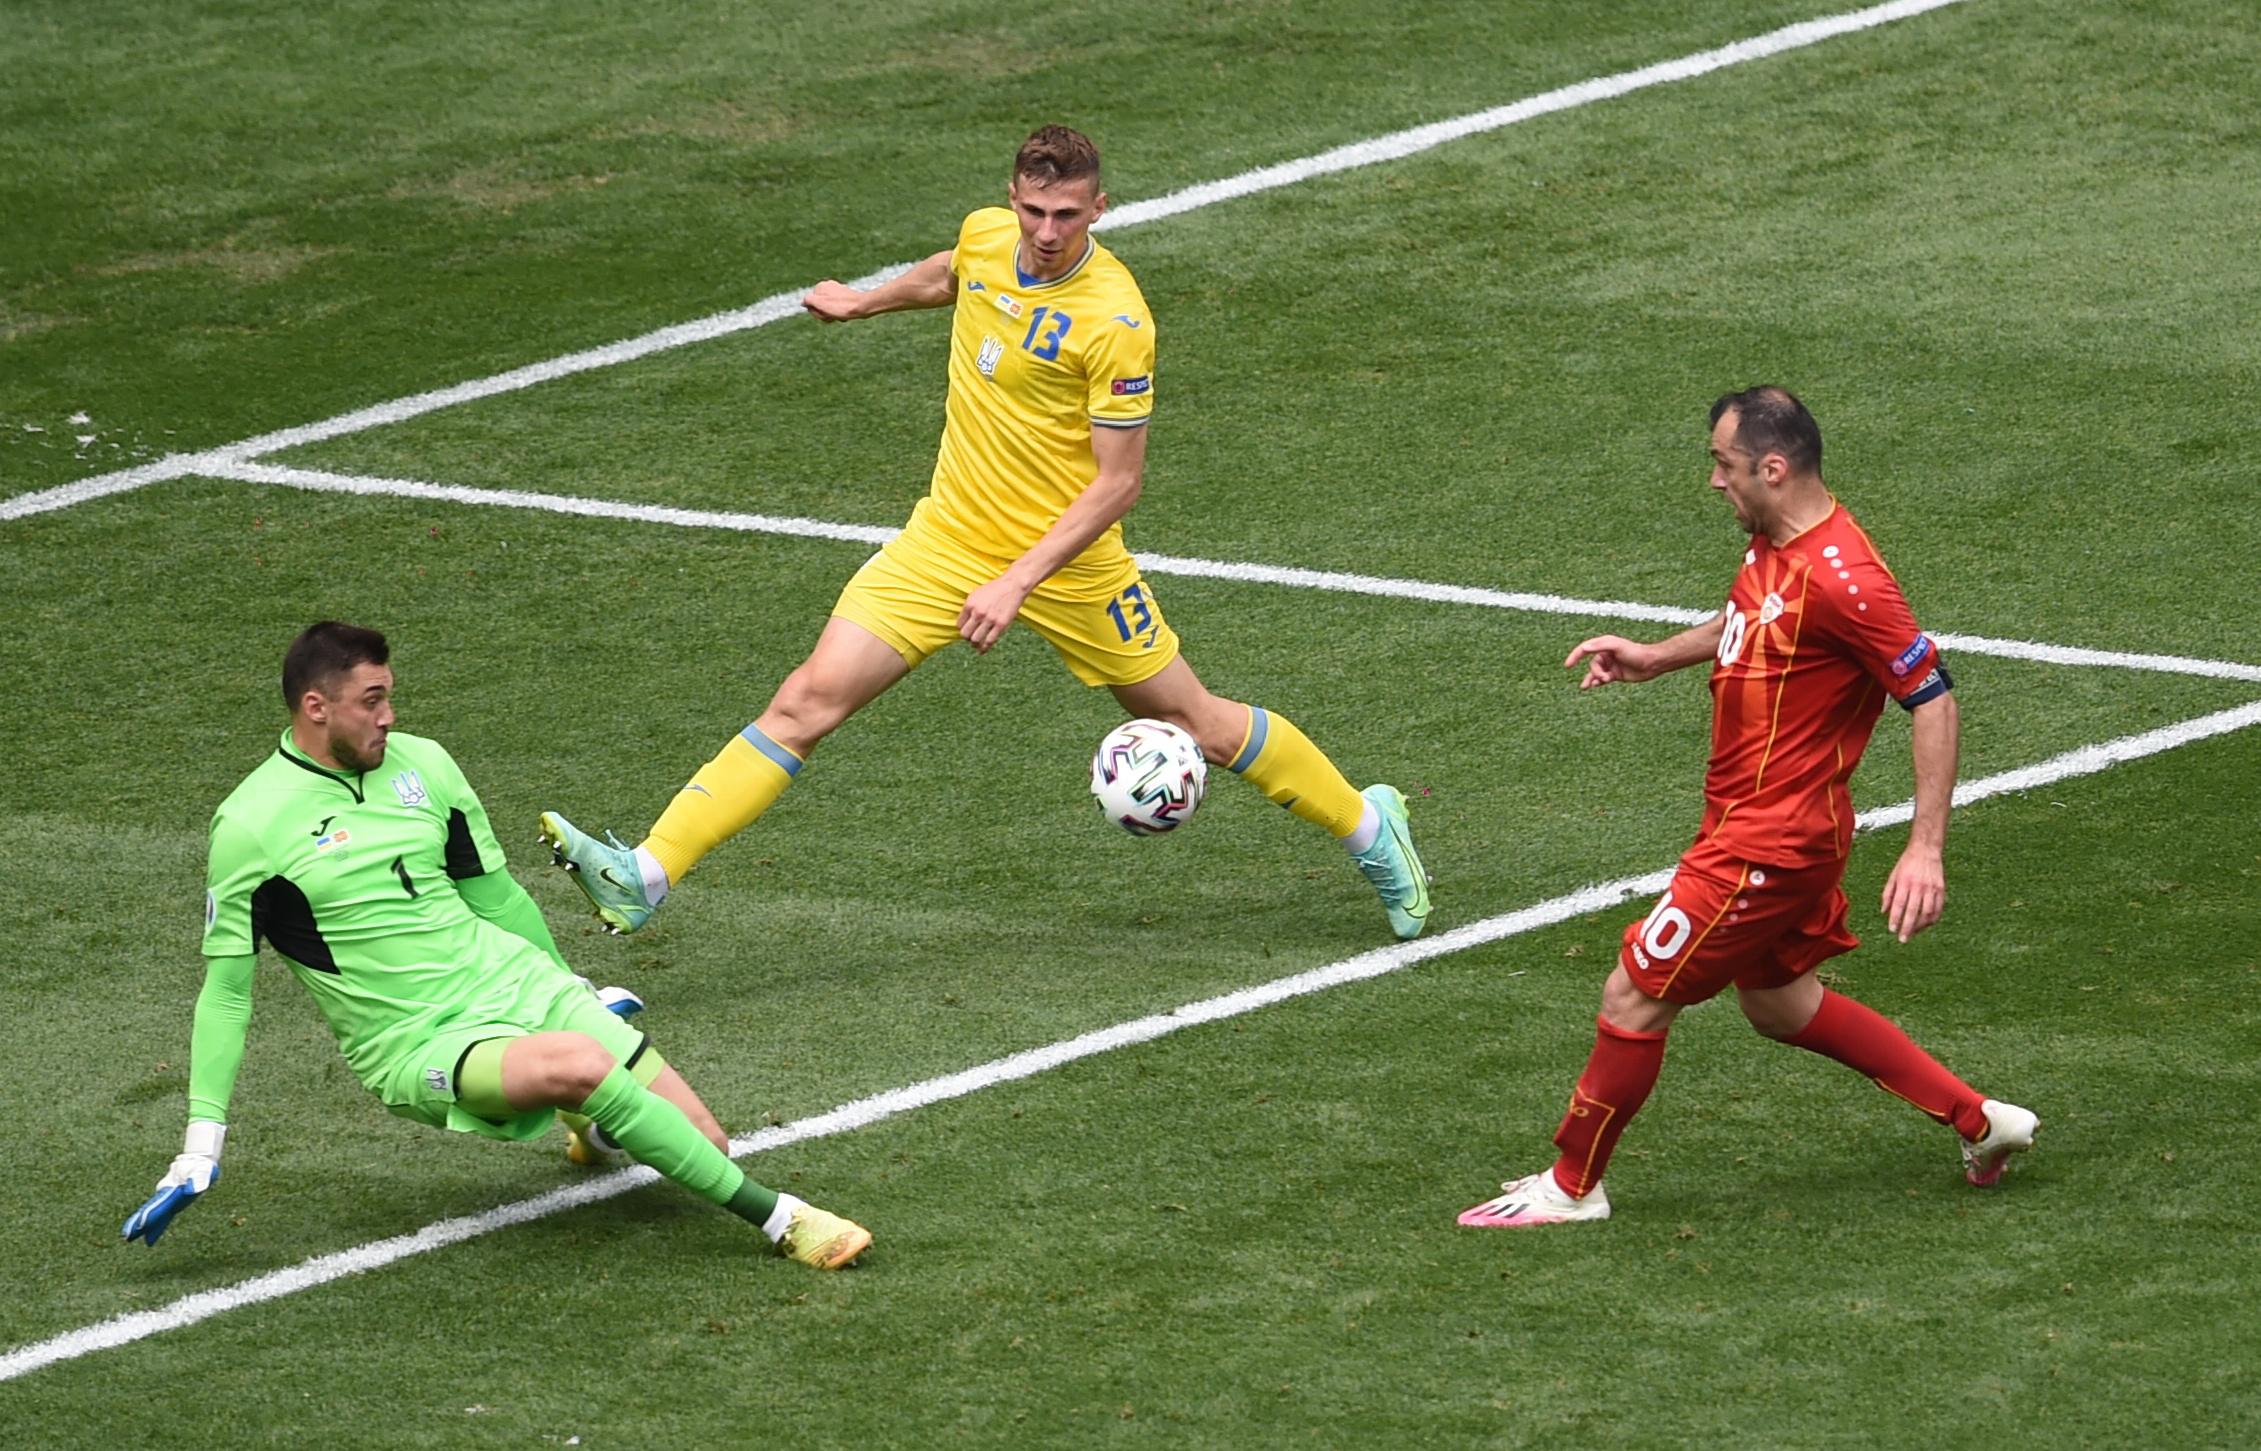 Euro 2020: Το VAR ακύρωσε γκολάρα του 38χρονου Πάντεφ